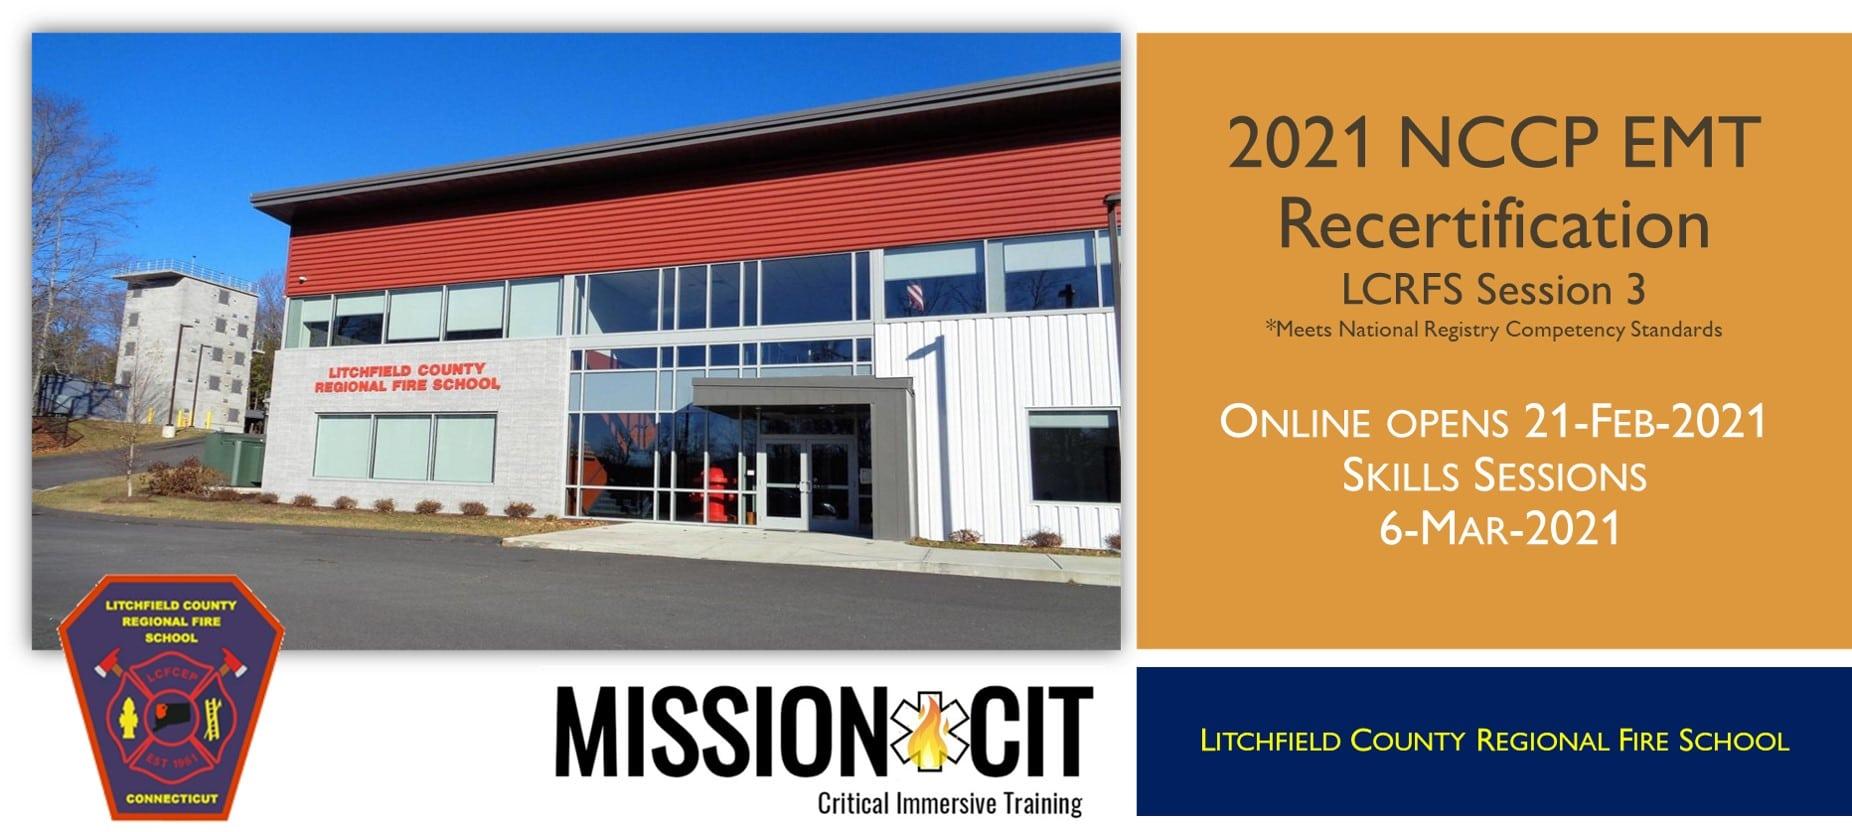 EMT NCCP 2021 Recertification Course   LCRFS Session 3